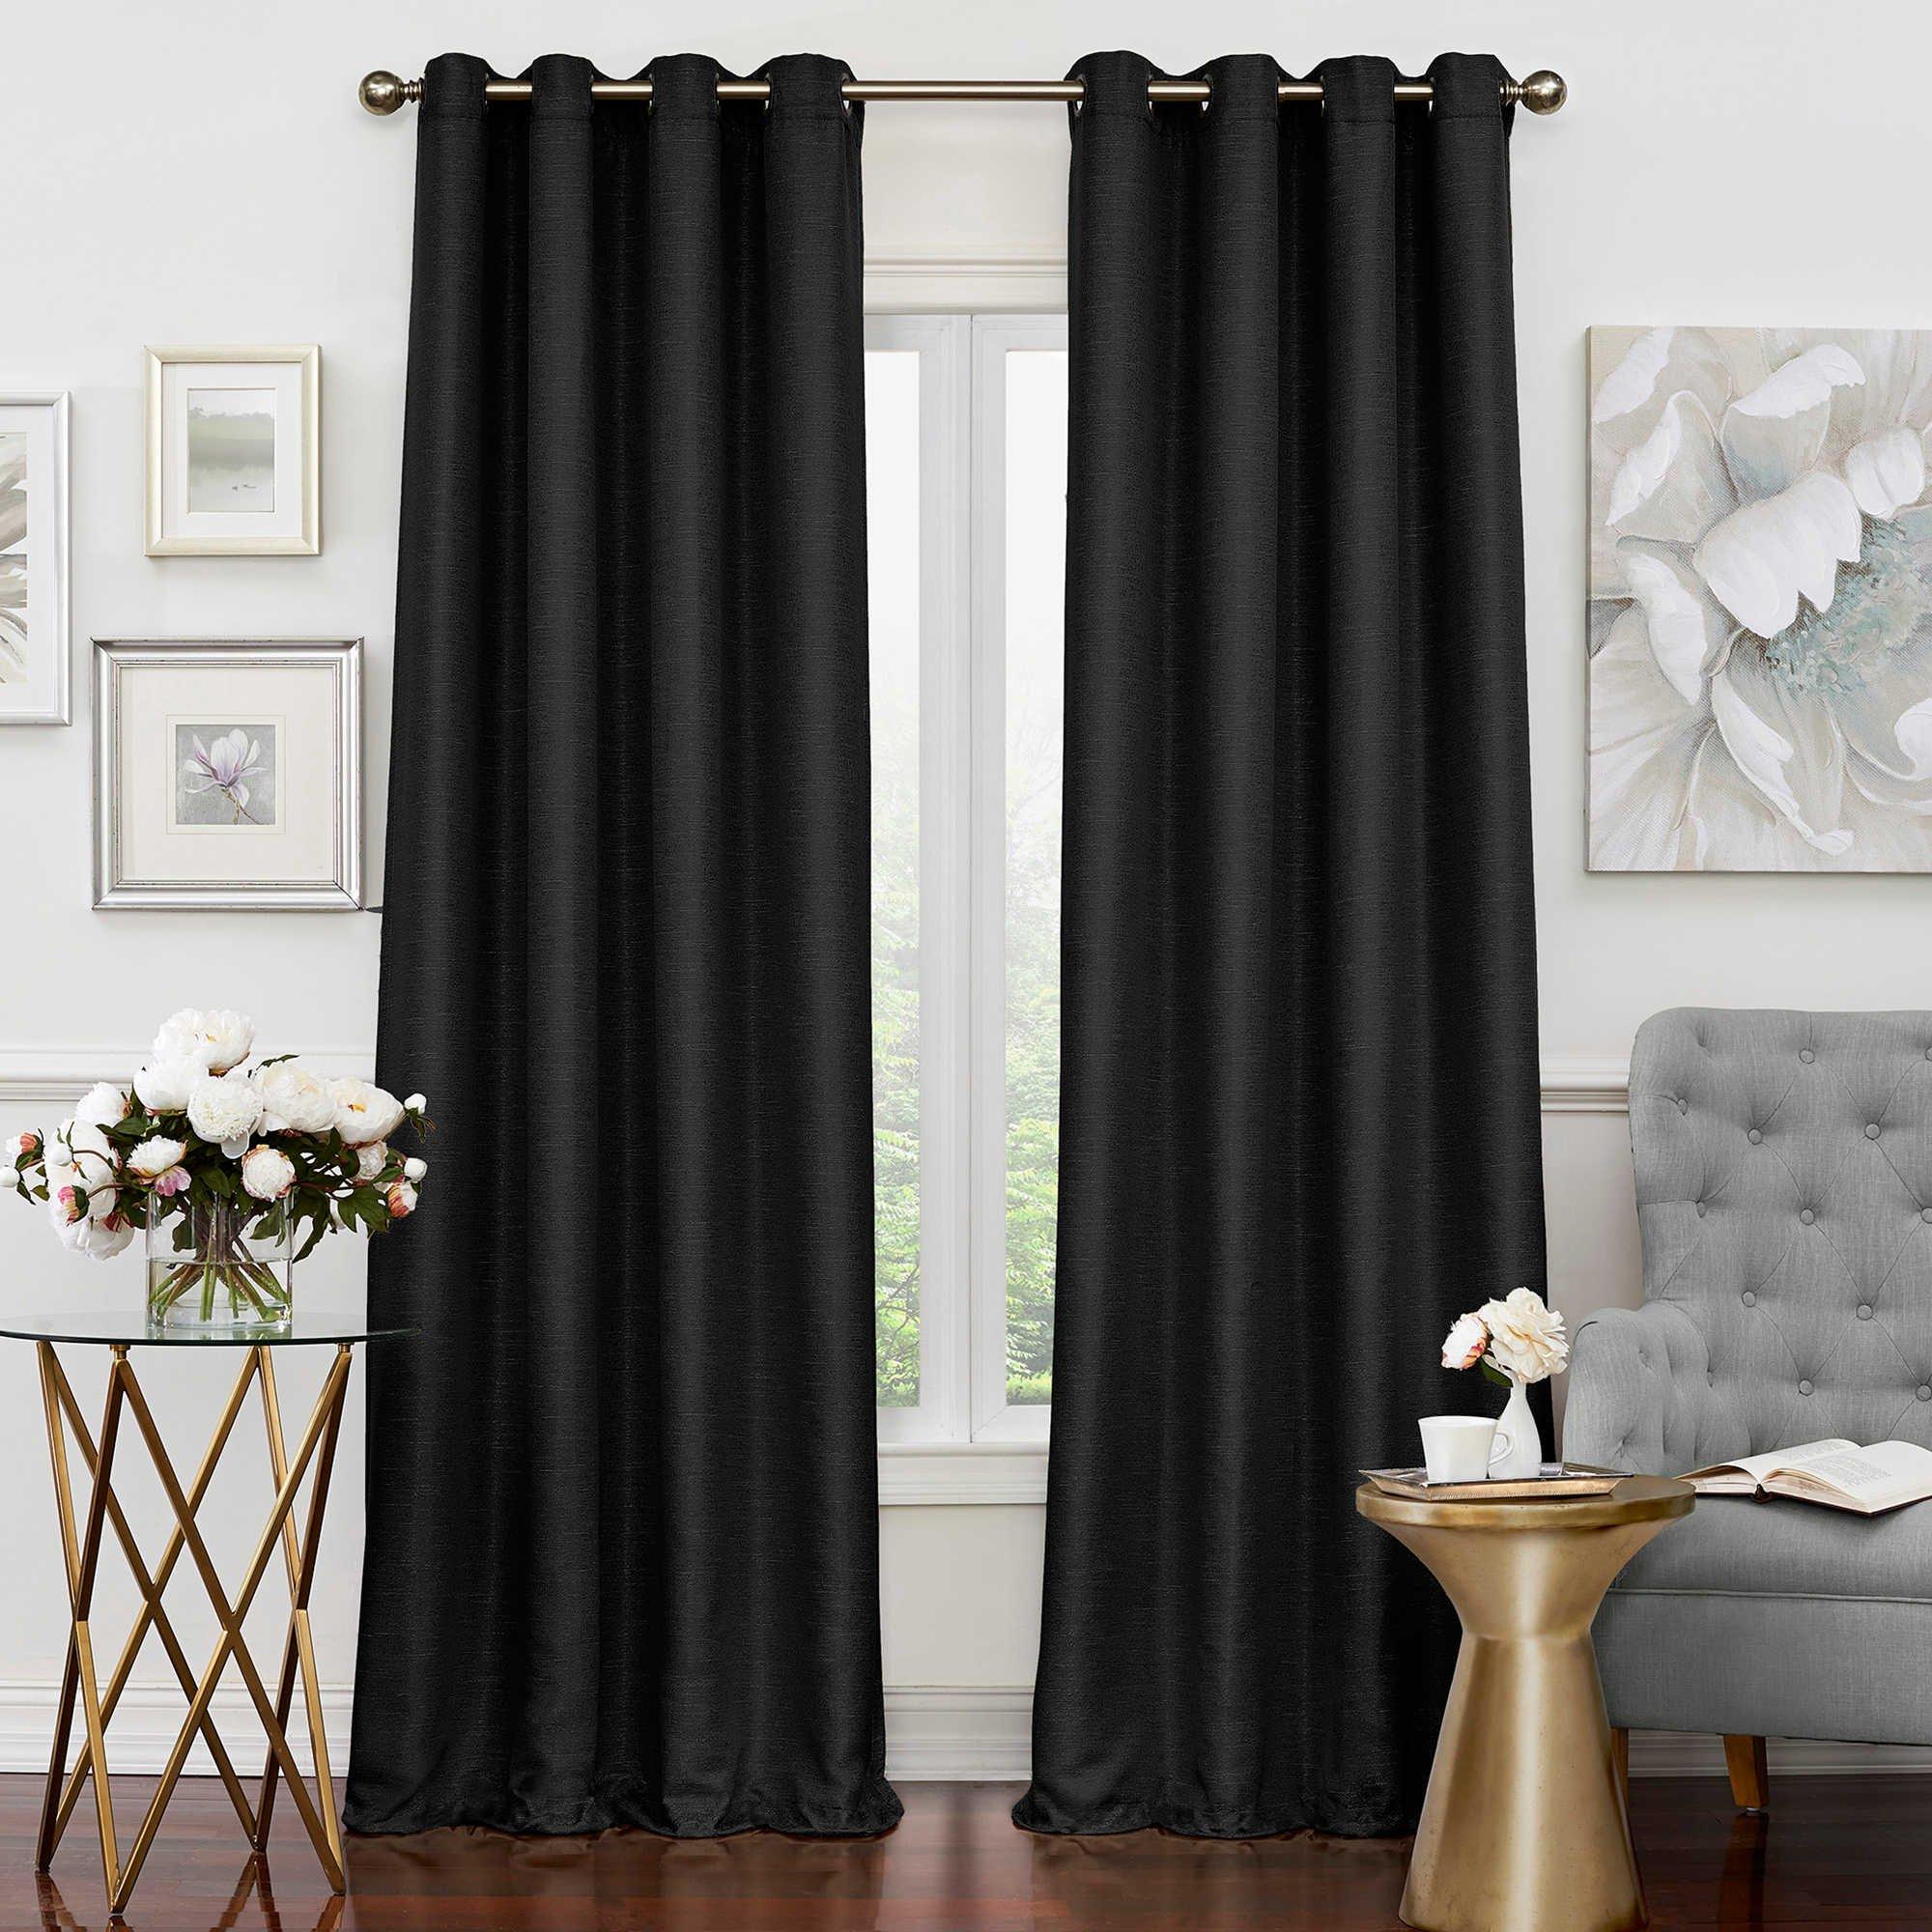 Solar Shield Neilson Grommet Room Darkening Window Curtain Panel (108-Inch, BLACK)